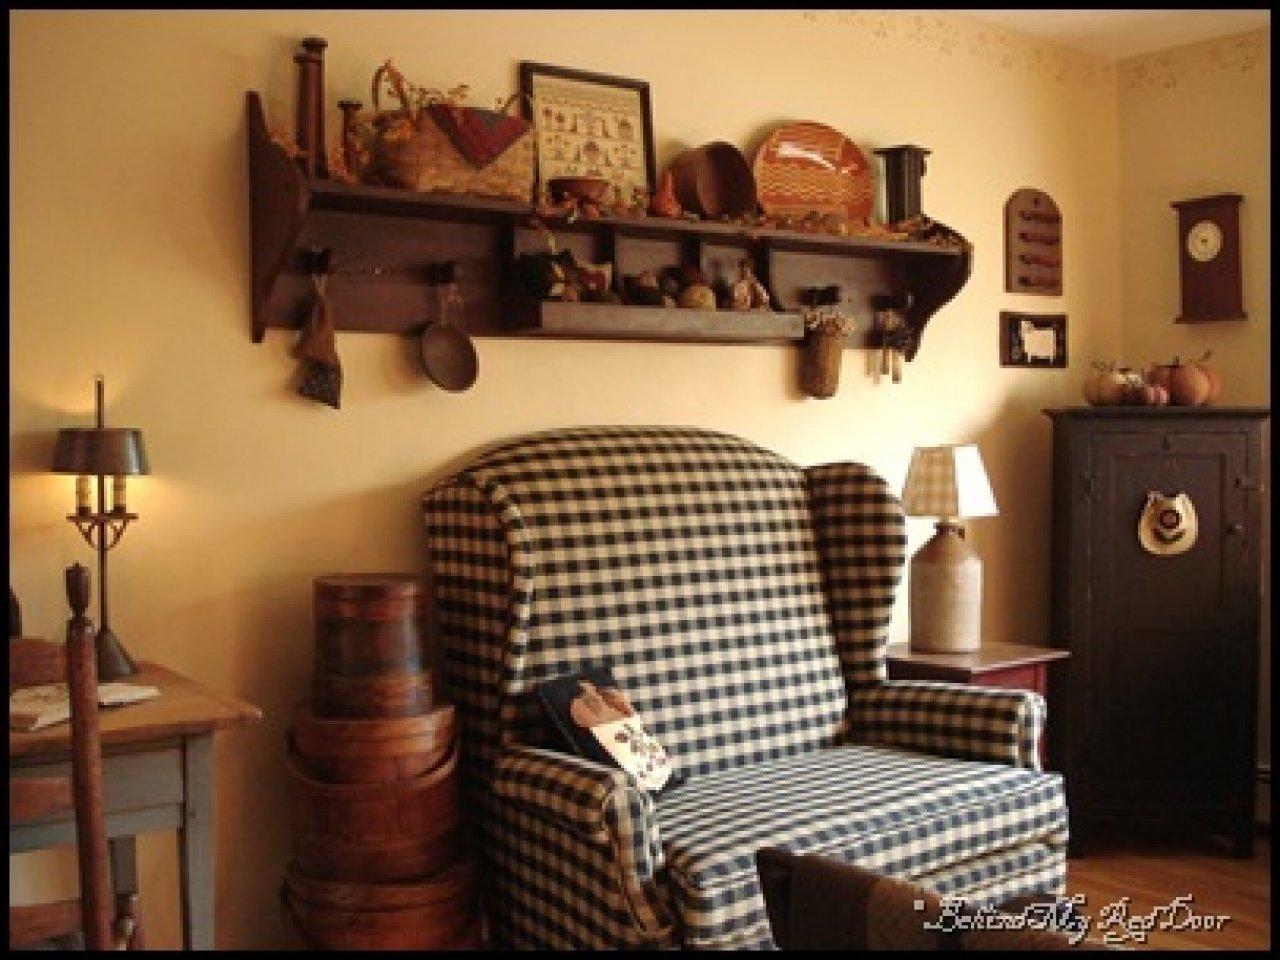 10 Nice Primitive Decorating Ideas For Living Room primitive country living room decorating ideas meliving 9d7a52cd30d3 2021